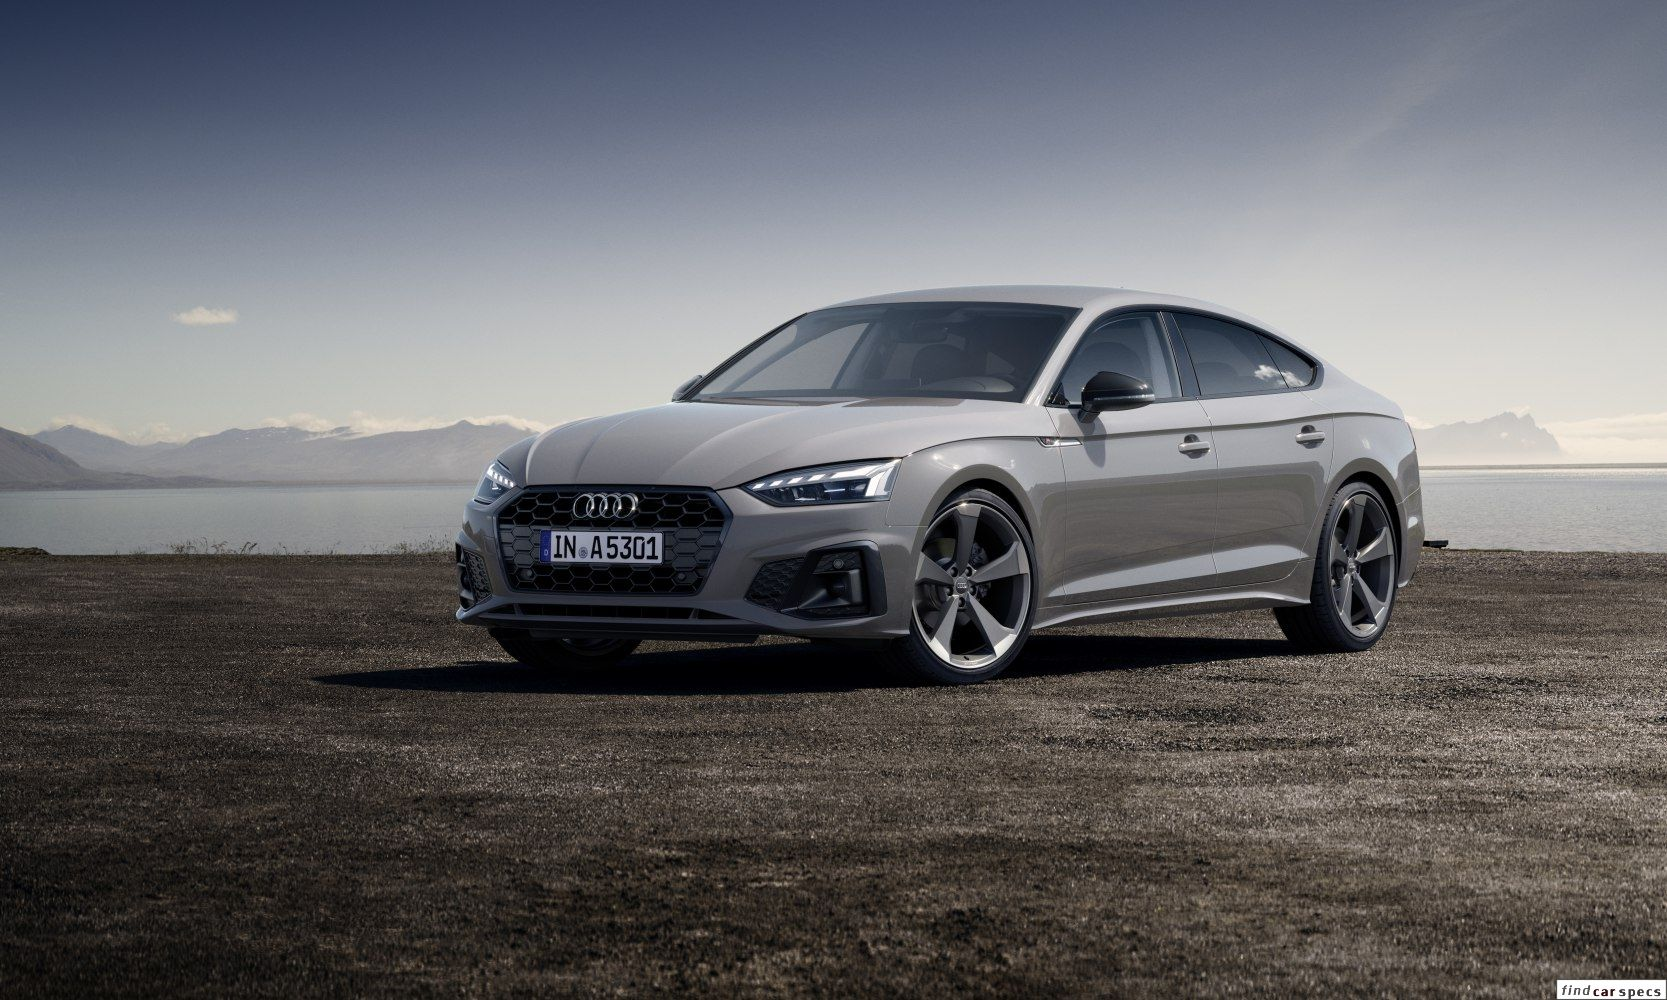 Audi A5 A5 Sportback 9t Facelift 2020 35 Tdi 163 Hp S Tronic Diesel 2019 A5 Sportback 9t Facelift Audi A5 Audi A5 Sportback A5 Sportback